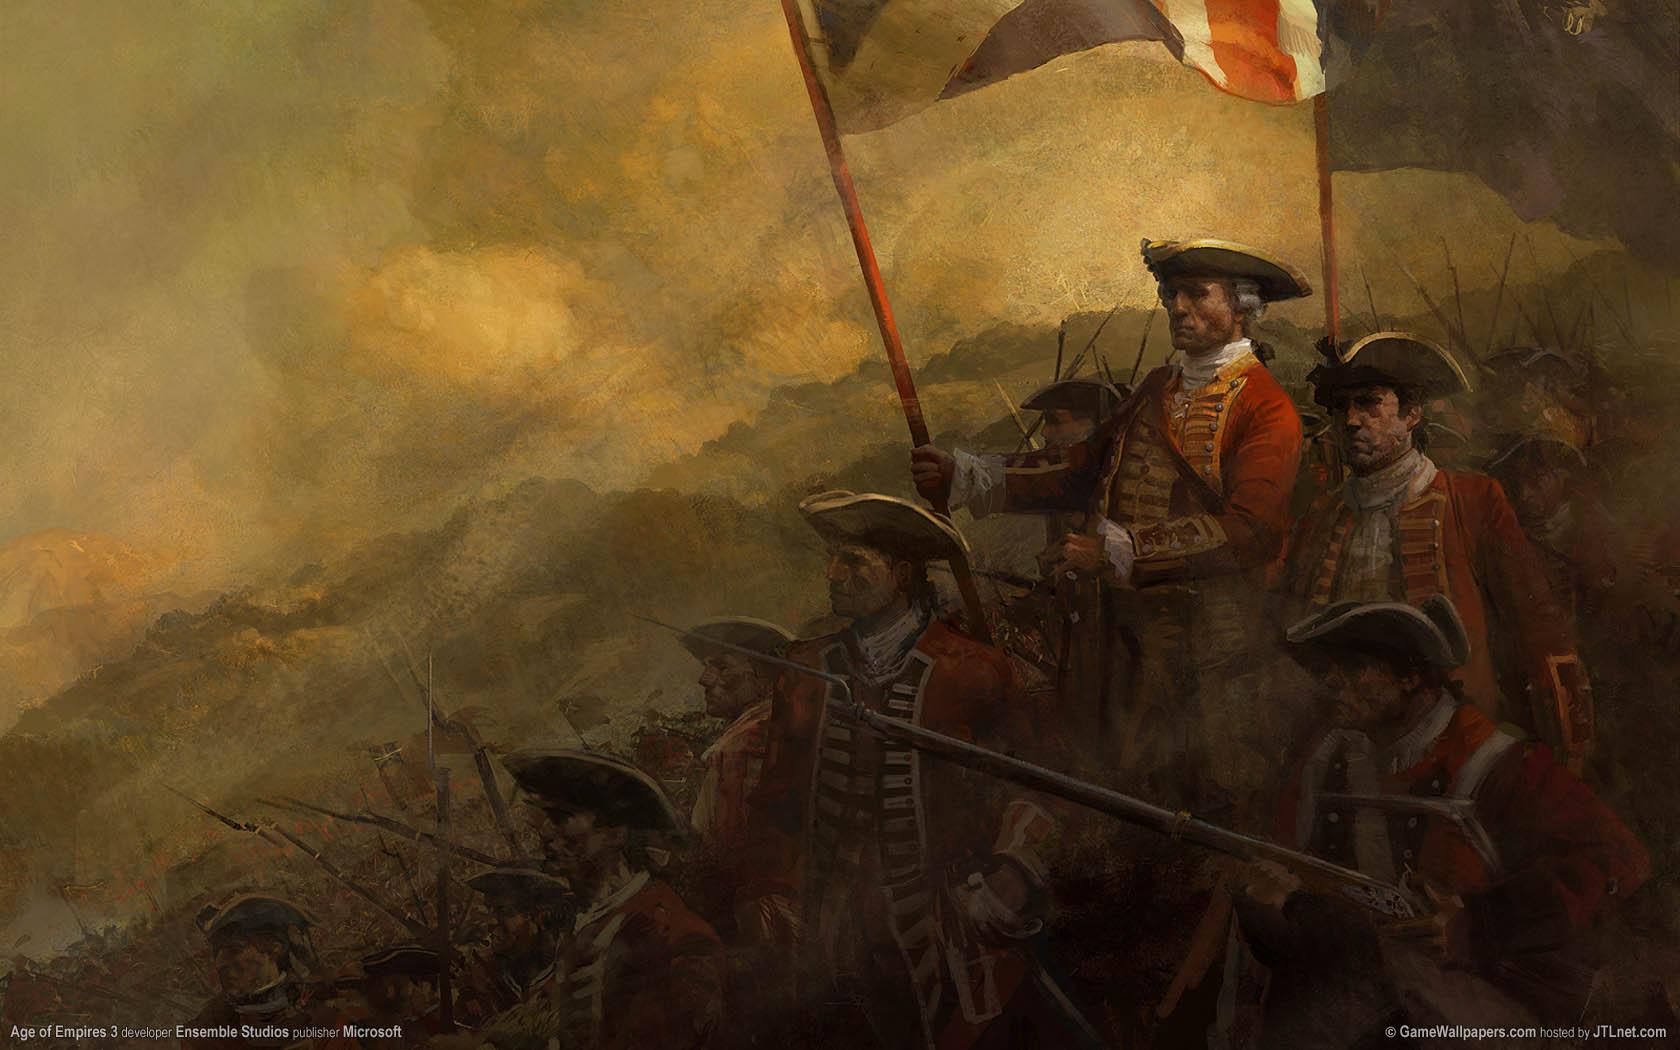 Age of Empires 3 fondo de escritorio 03 1680x1050